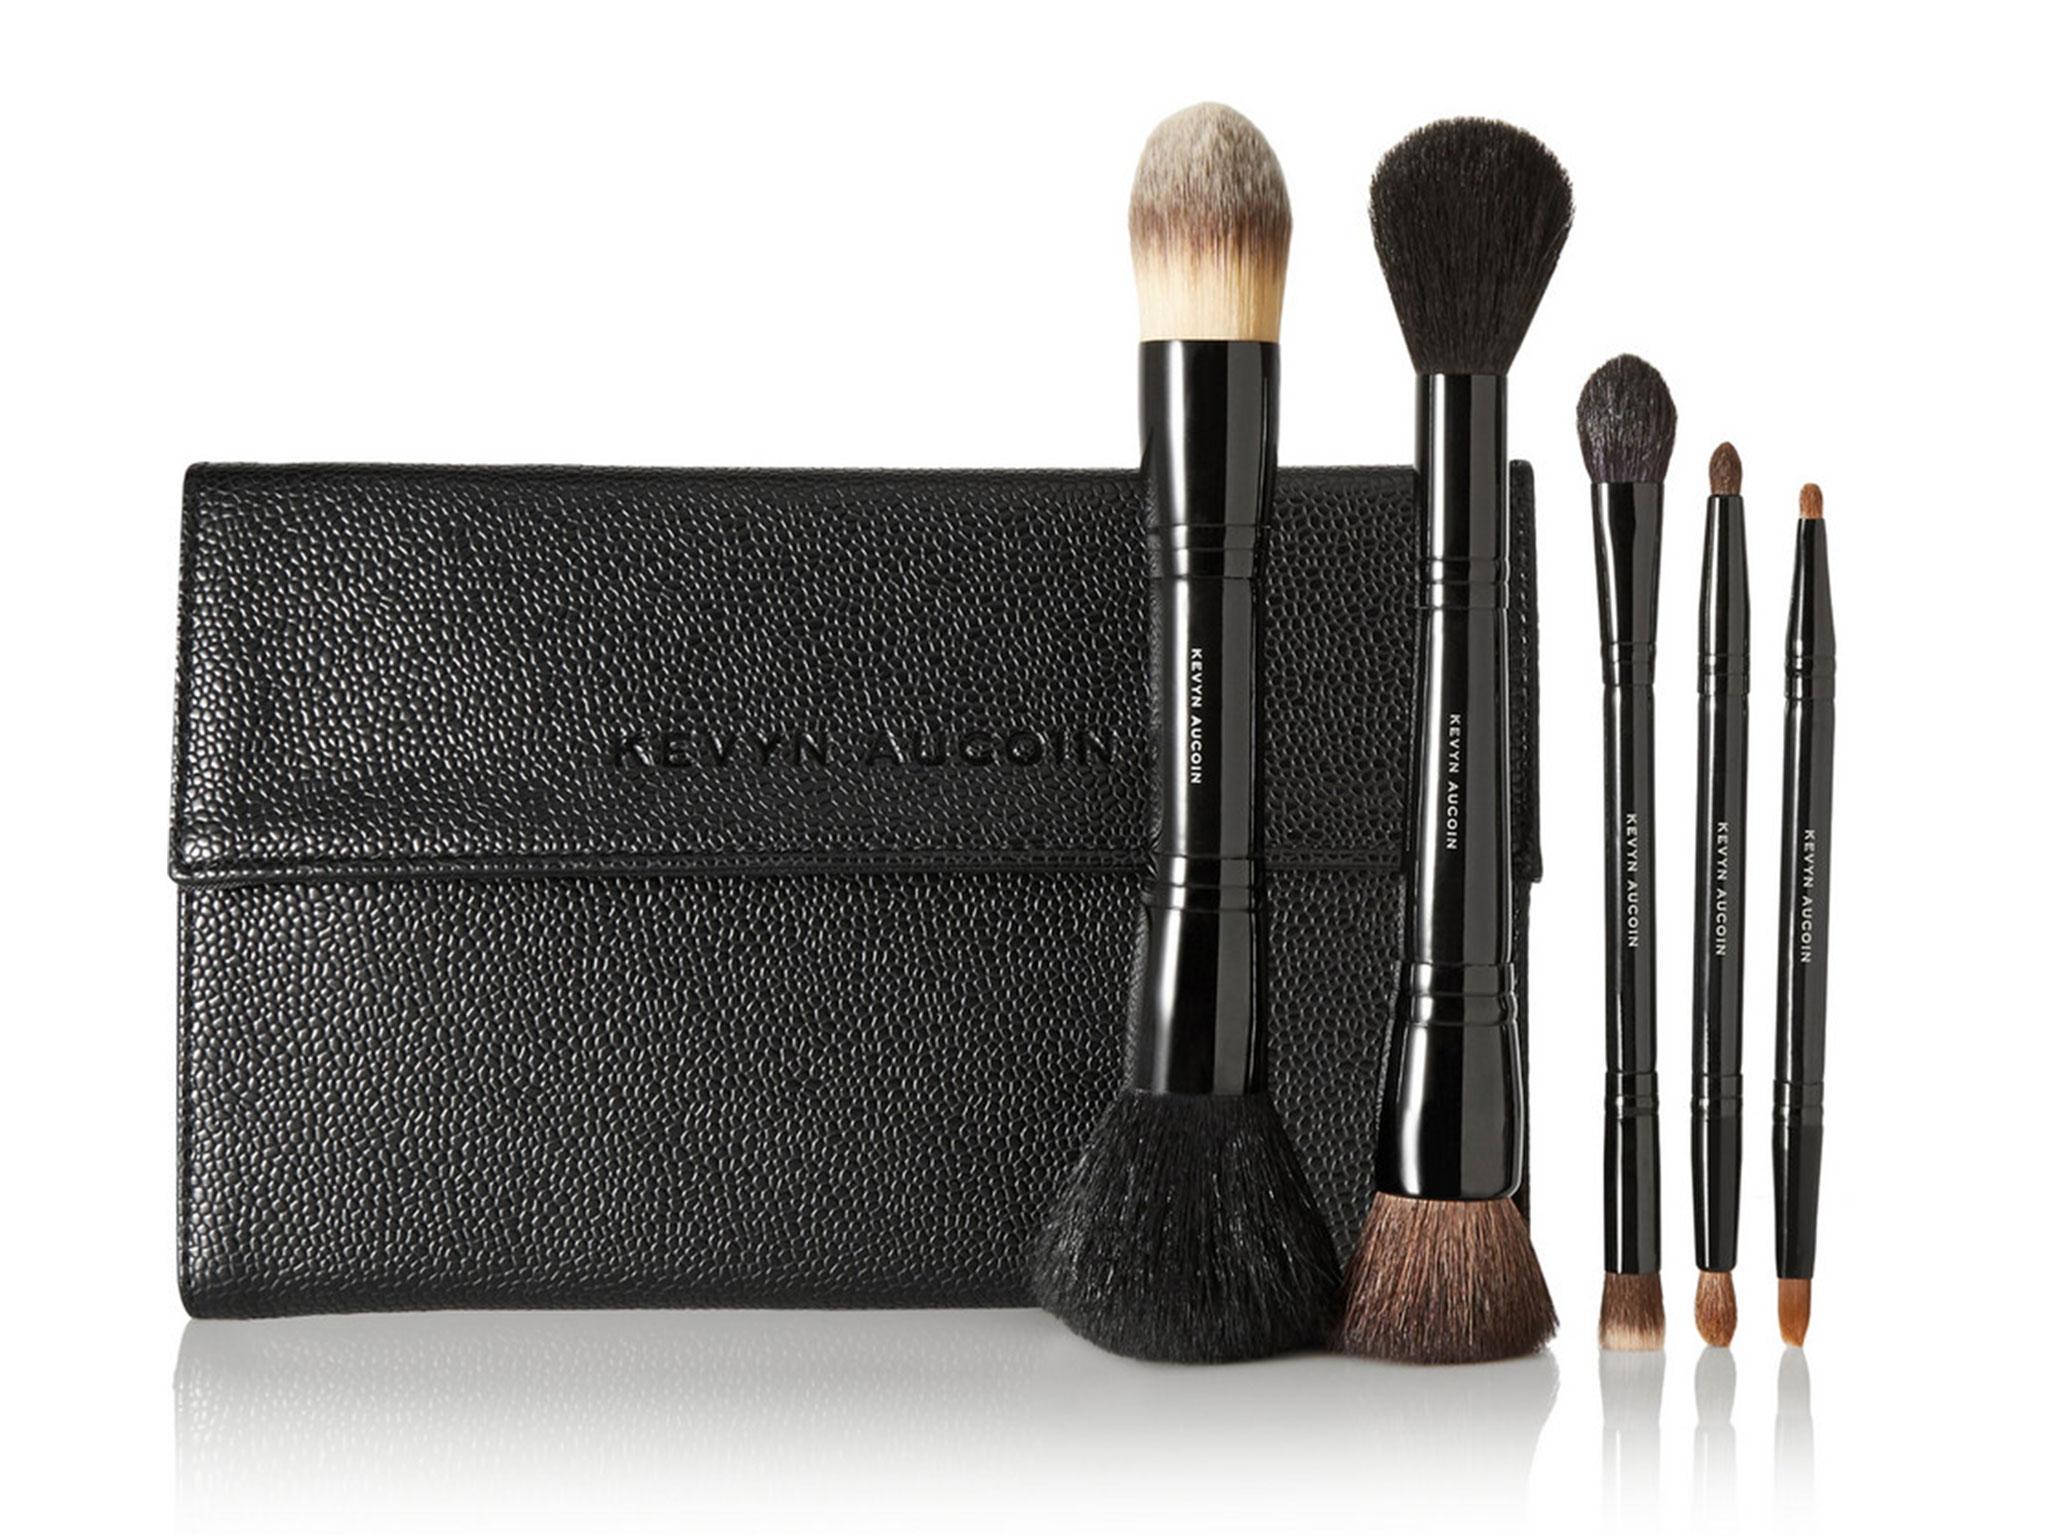 10 Best Make Up Brush Sets The Independent Zoeva Dark Brown 8 Piece Bursh Set Bag While